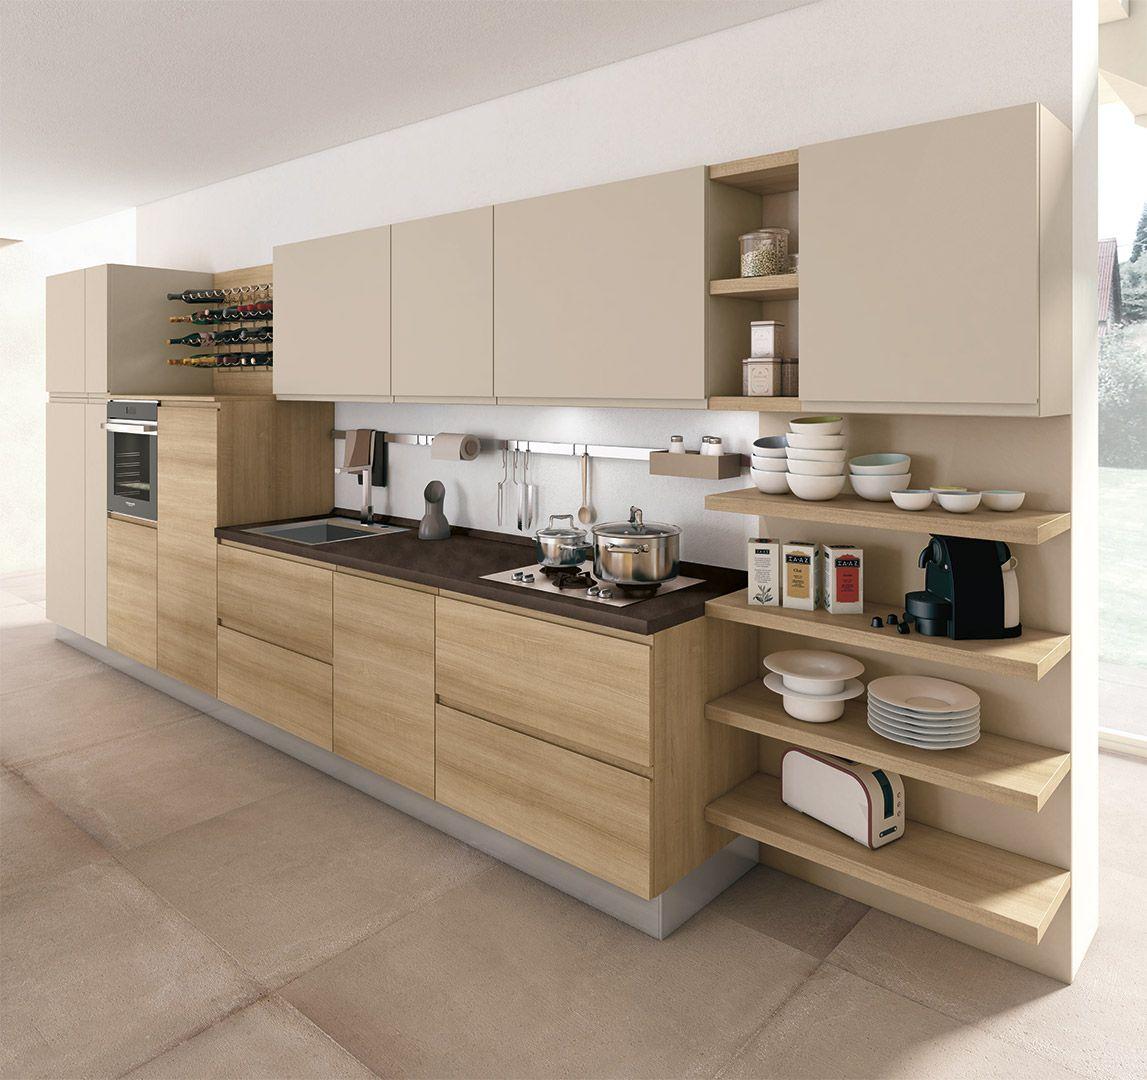 Cucina jey cucine moderne creo kitchens model jey for Decorazioni cucine moderne